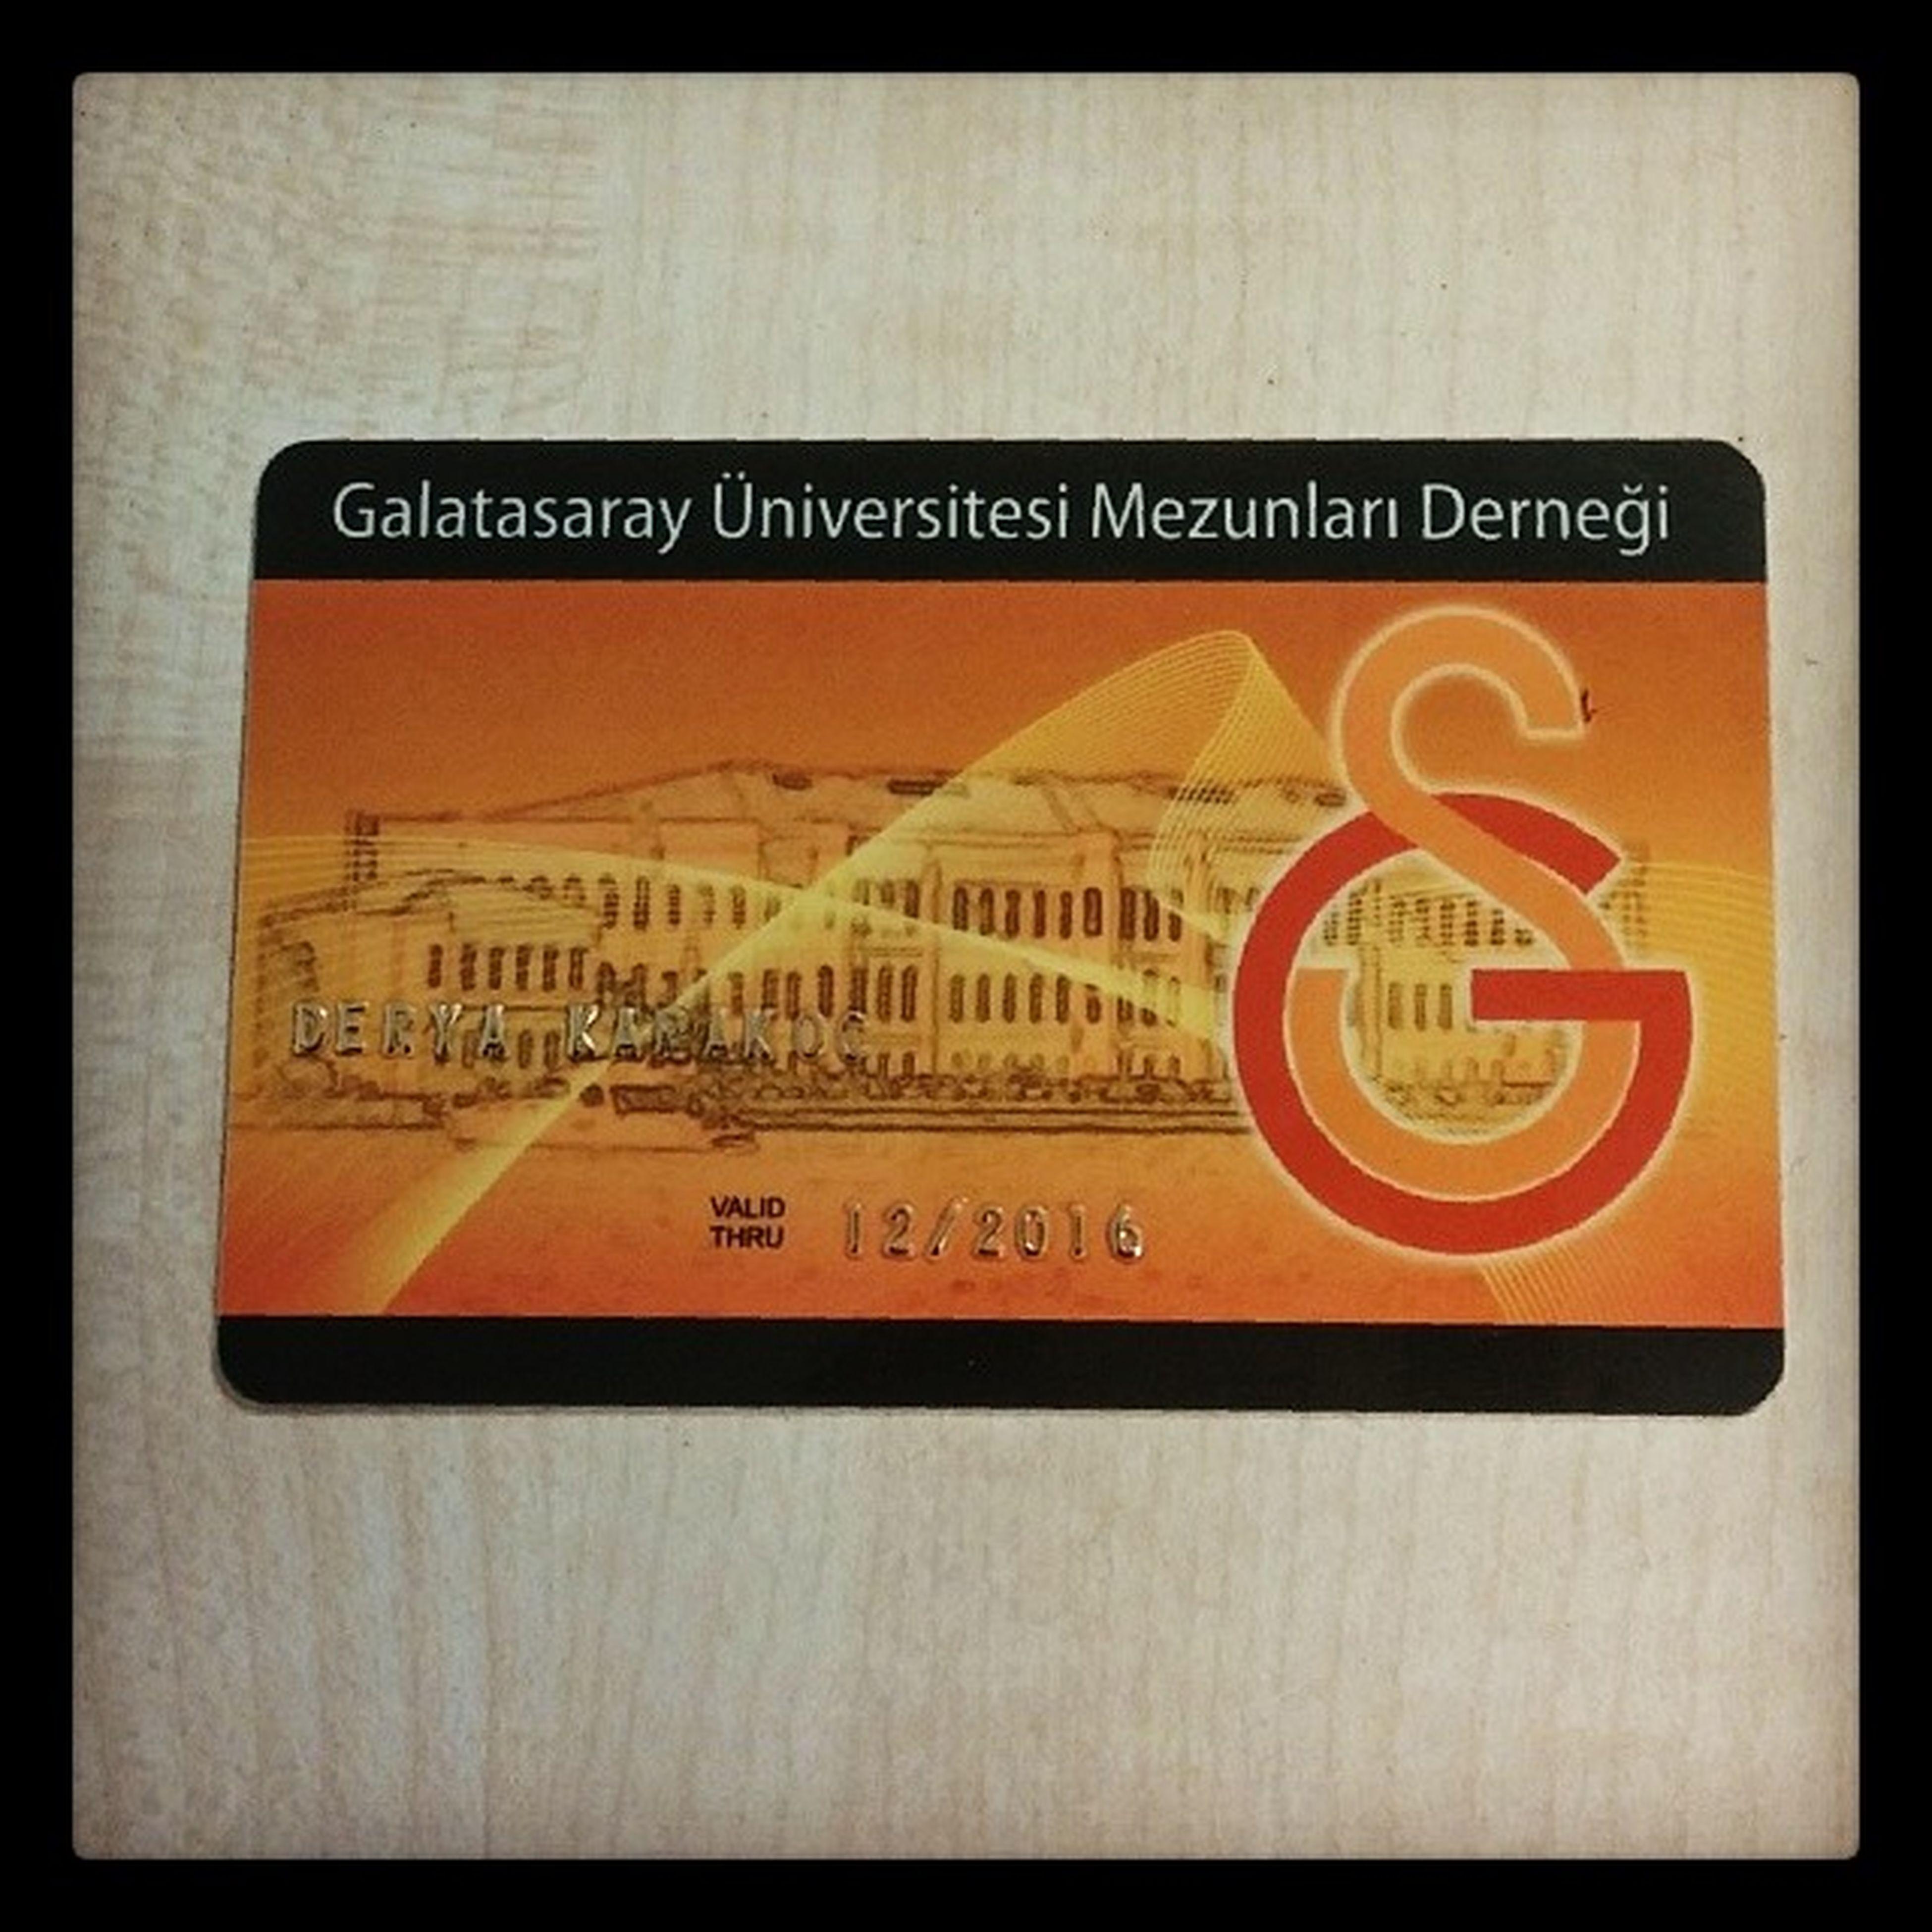 9'unda secim var, iyi olan kazansin? Gsumed GSU Galatasarayuniversitesi Mezun galatasarayuniversity gsumedorg